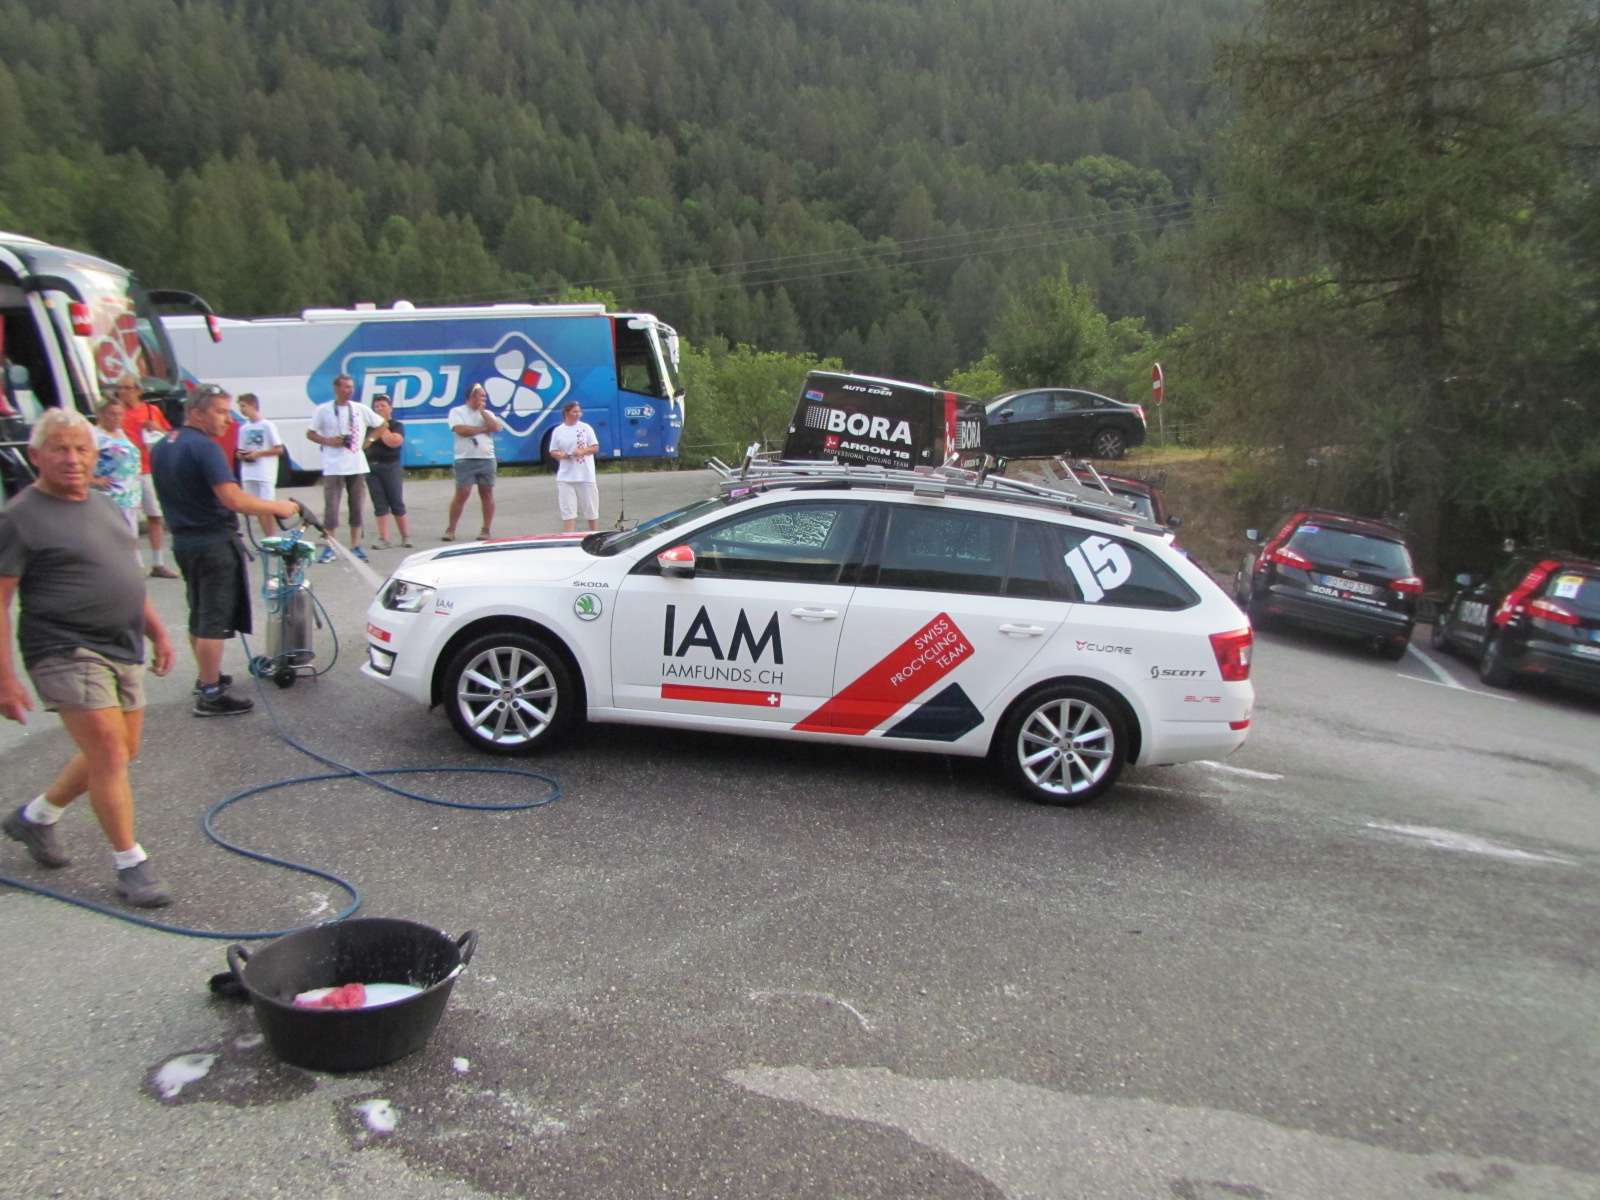 Team Iam Cycling